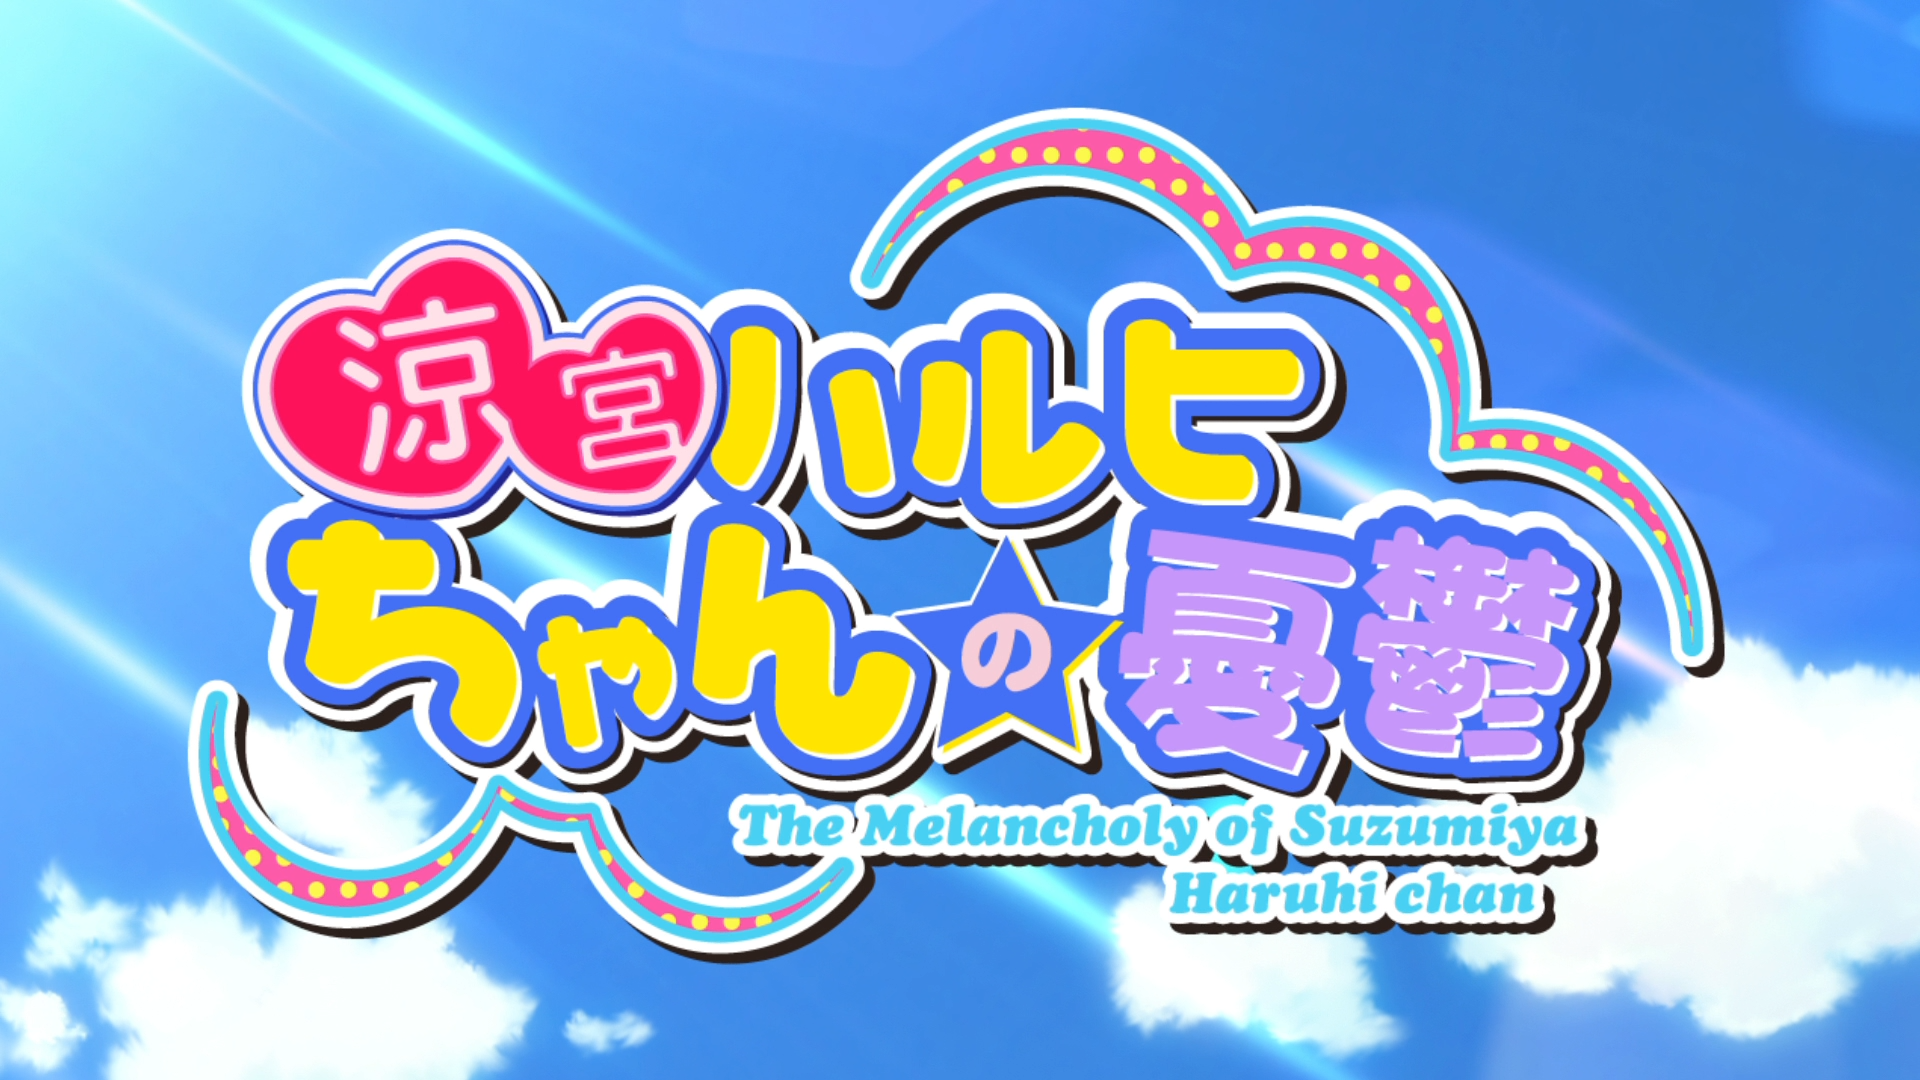 The Melancholy Of Haruhi Chan Suzumiya Pc Game Haruhi Wiki